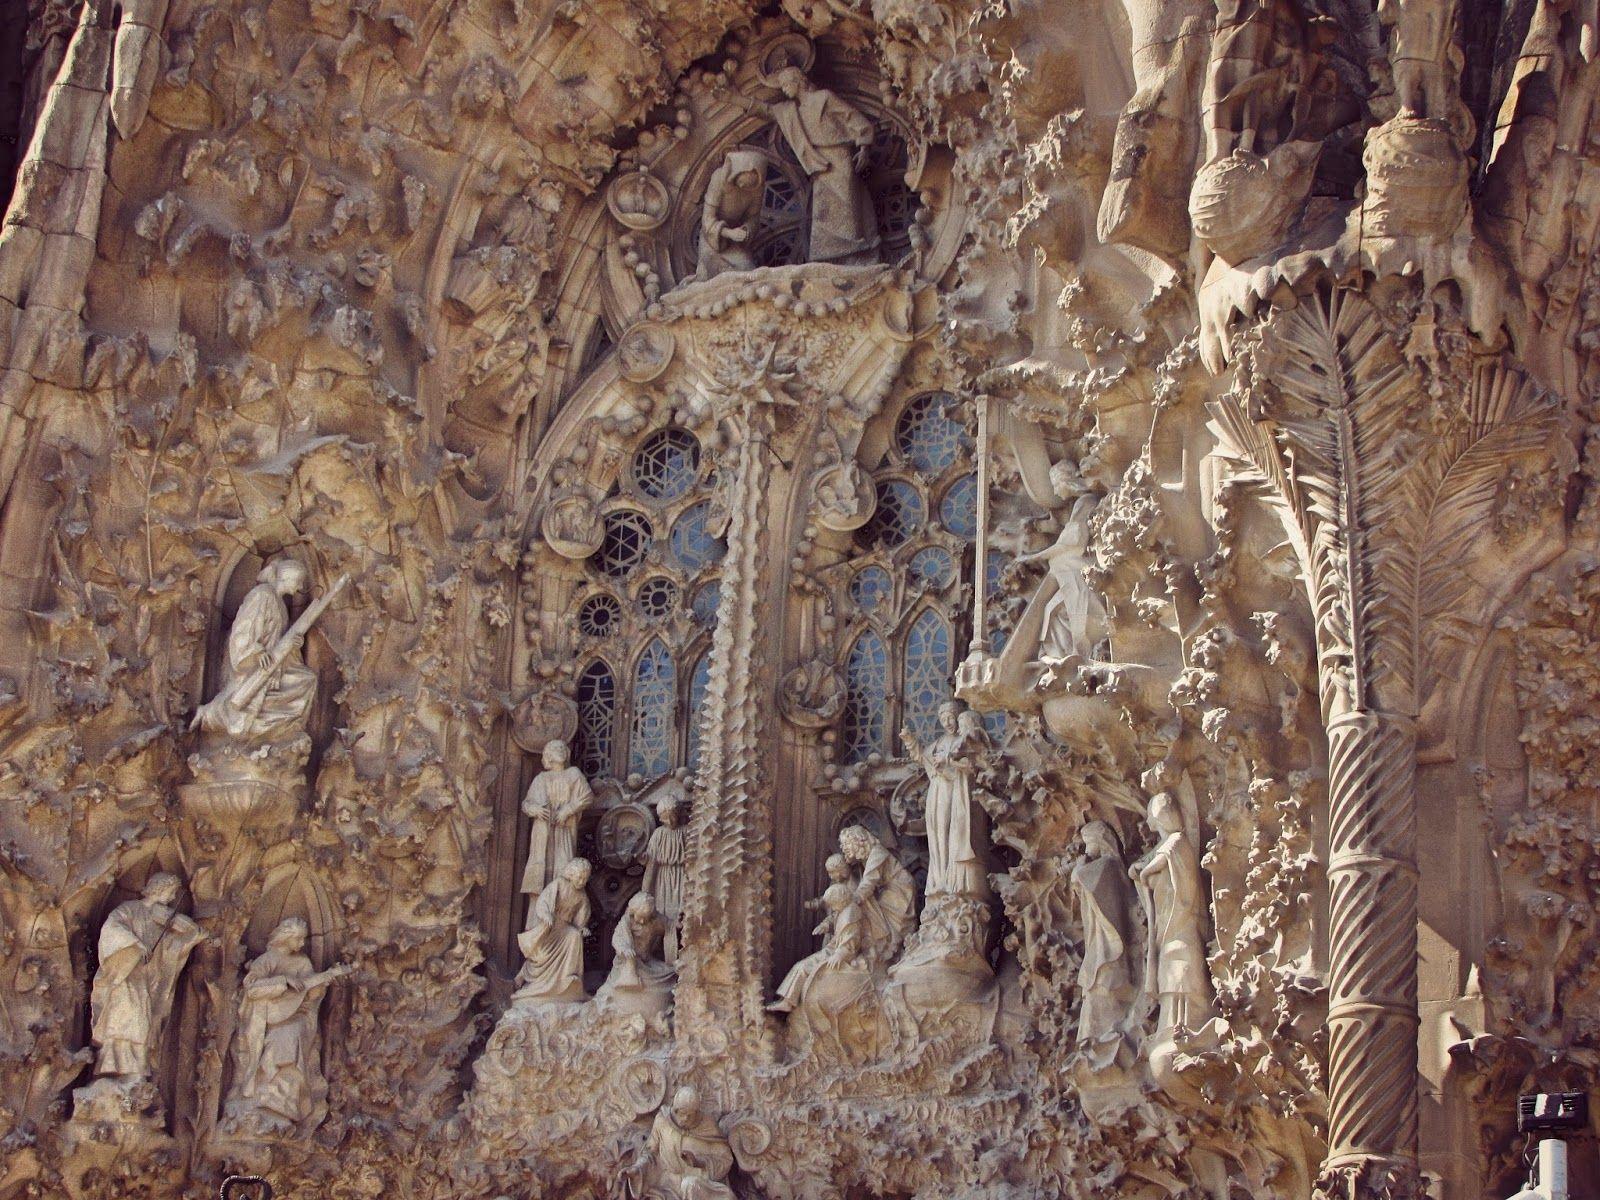 lady in black: One day in Barcelona  #barcelona #spain #cataluna #catalansko #sagradafamilia #spanielsko #visitspain #visitacataluna #costabrava #traveltips #traveleurope #travel #travelblogging #visiteurope #placestogo #oldtown #placestogo #placestosee #gaudi #mediterranean #espana #espanaturismo #turismo #europa #holiday #holidaydestination #vacation